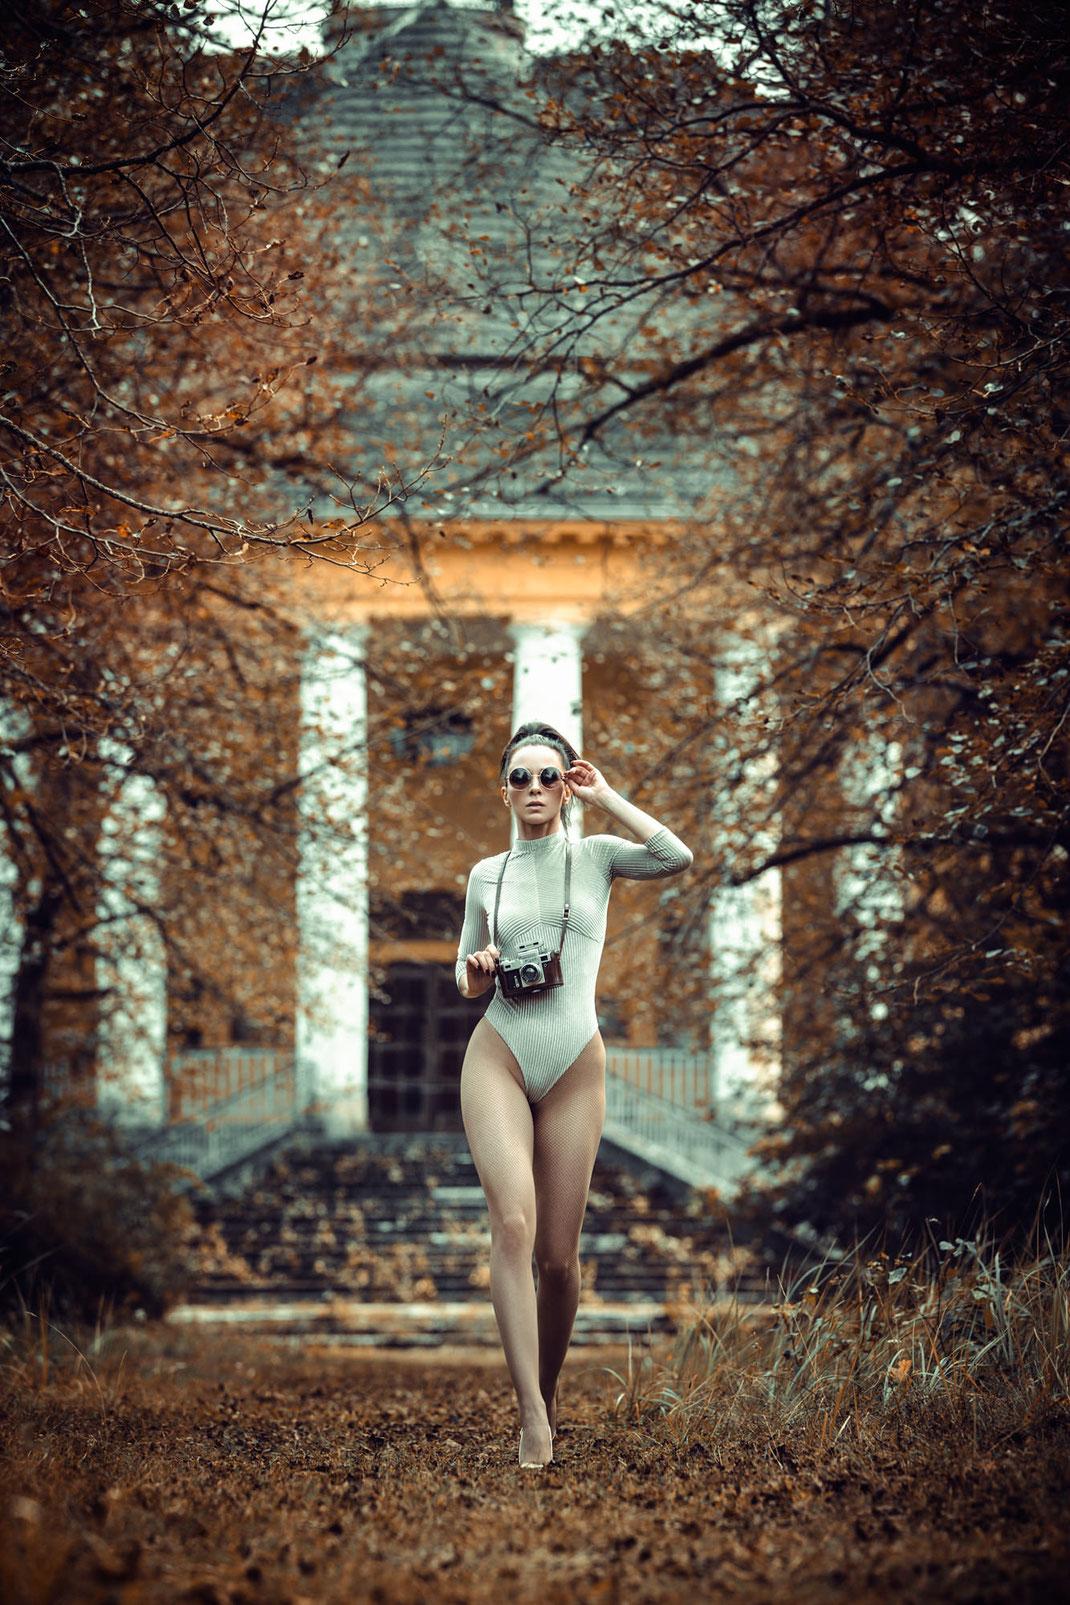 Two Beauties - Angélique & Kiev IV Contax Clone - Markus Hertzsch - Camera - Girl - Autumn